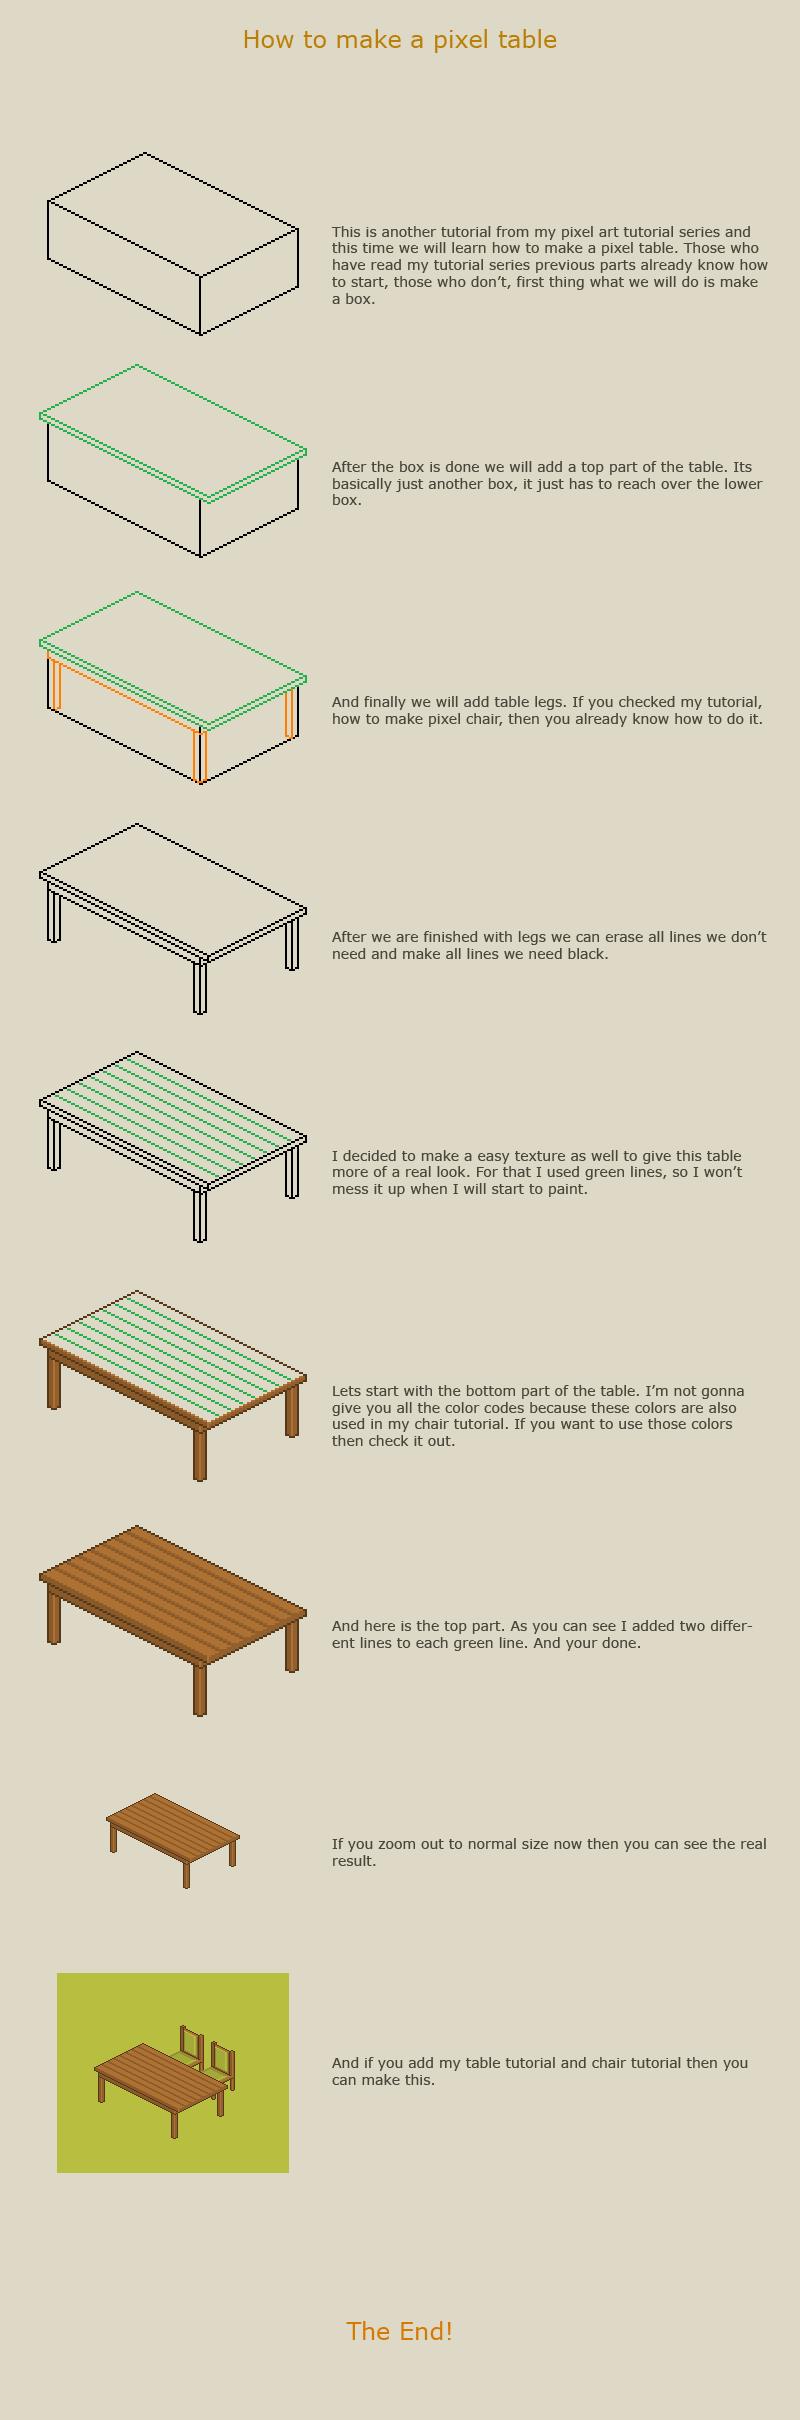 How To Make A Pixel Table By Vanmall On Deviantart Pixel Art Retro Tutoriais